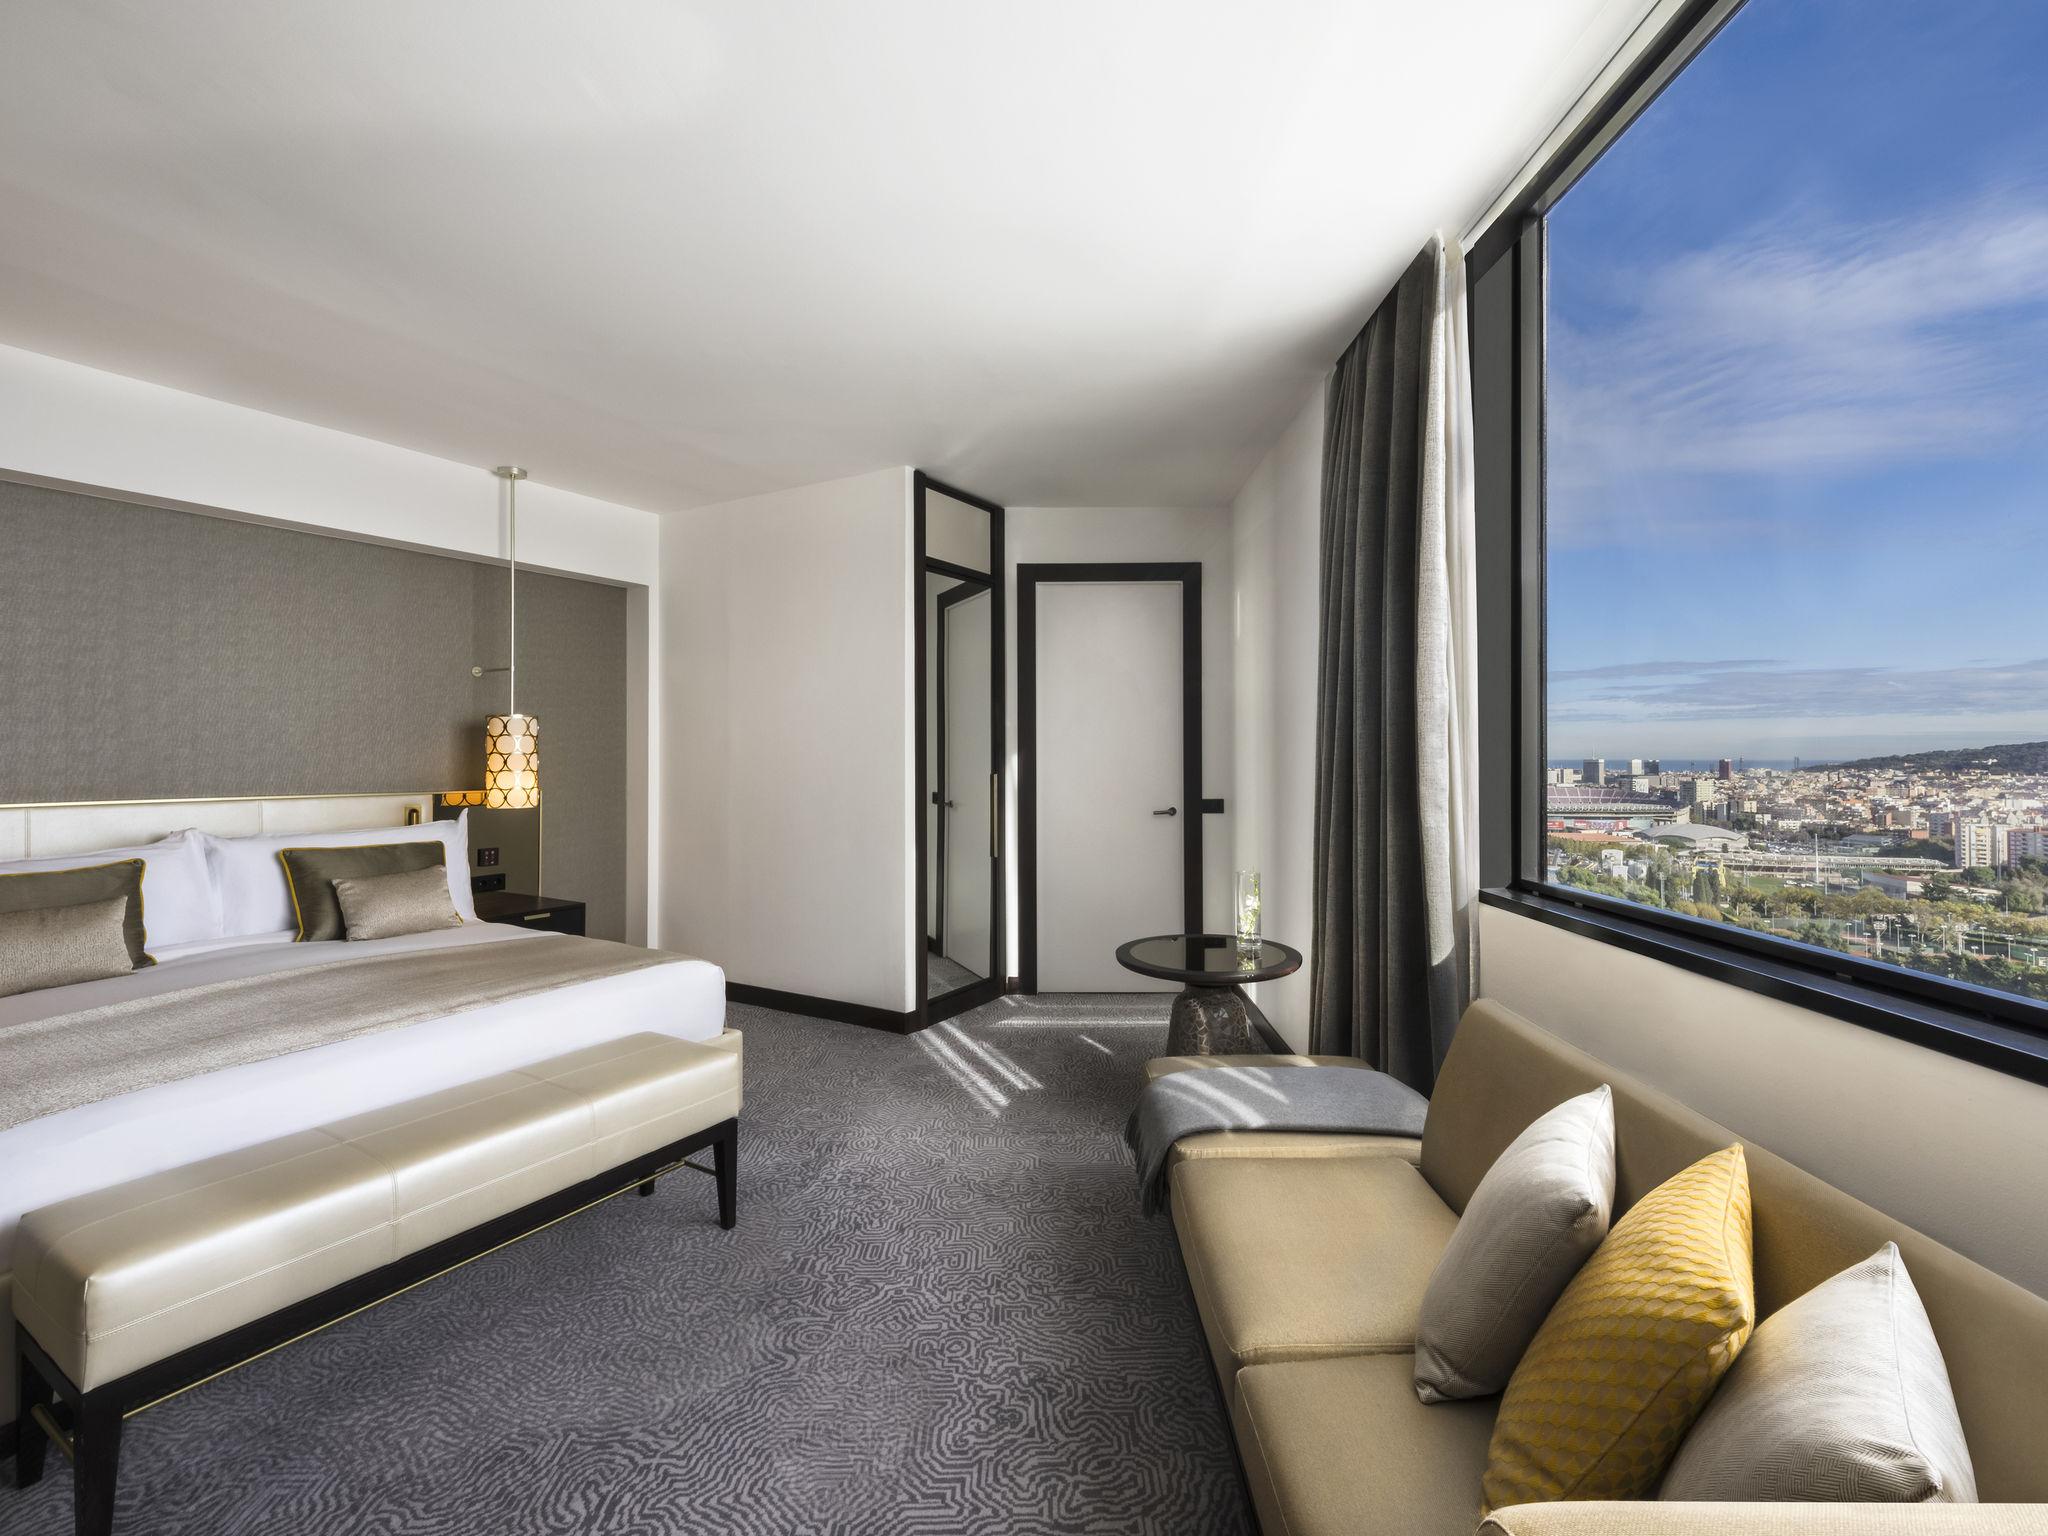 酒店 – Fairmont Rey Juan Carlos I - Barcelona 酒店